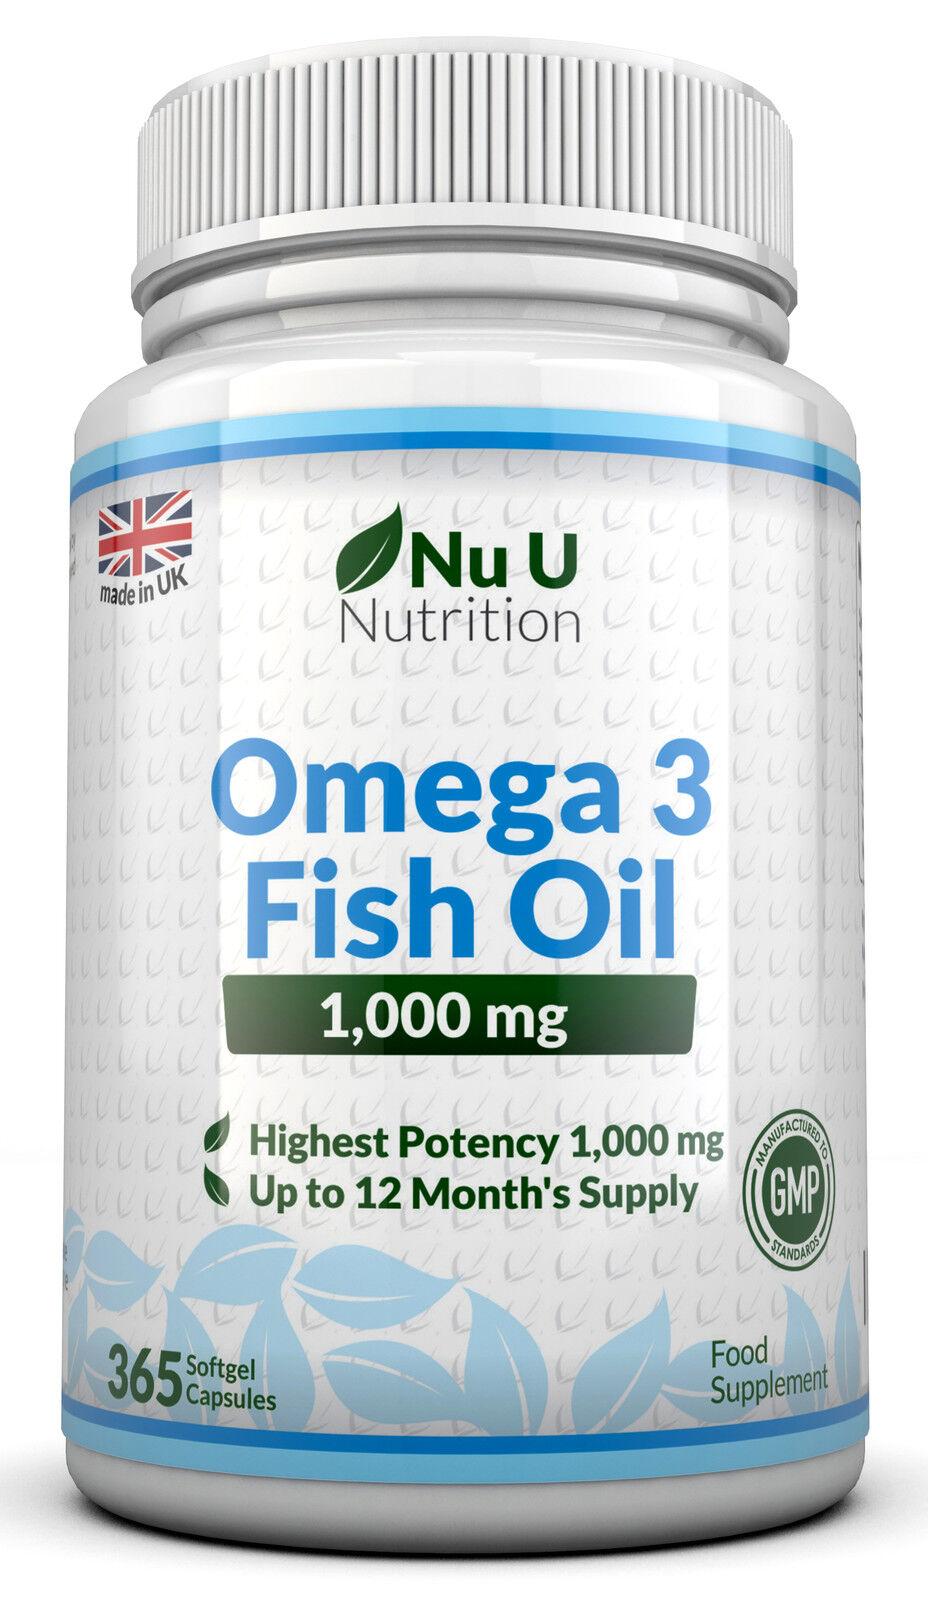 Nu u omega 3 fish oil 1000mg 365 softgels omega 3 6 9 dha for Fish oil 3 6 9